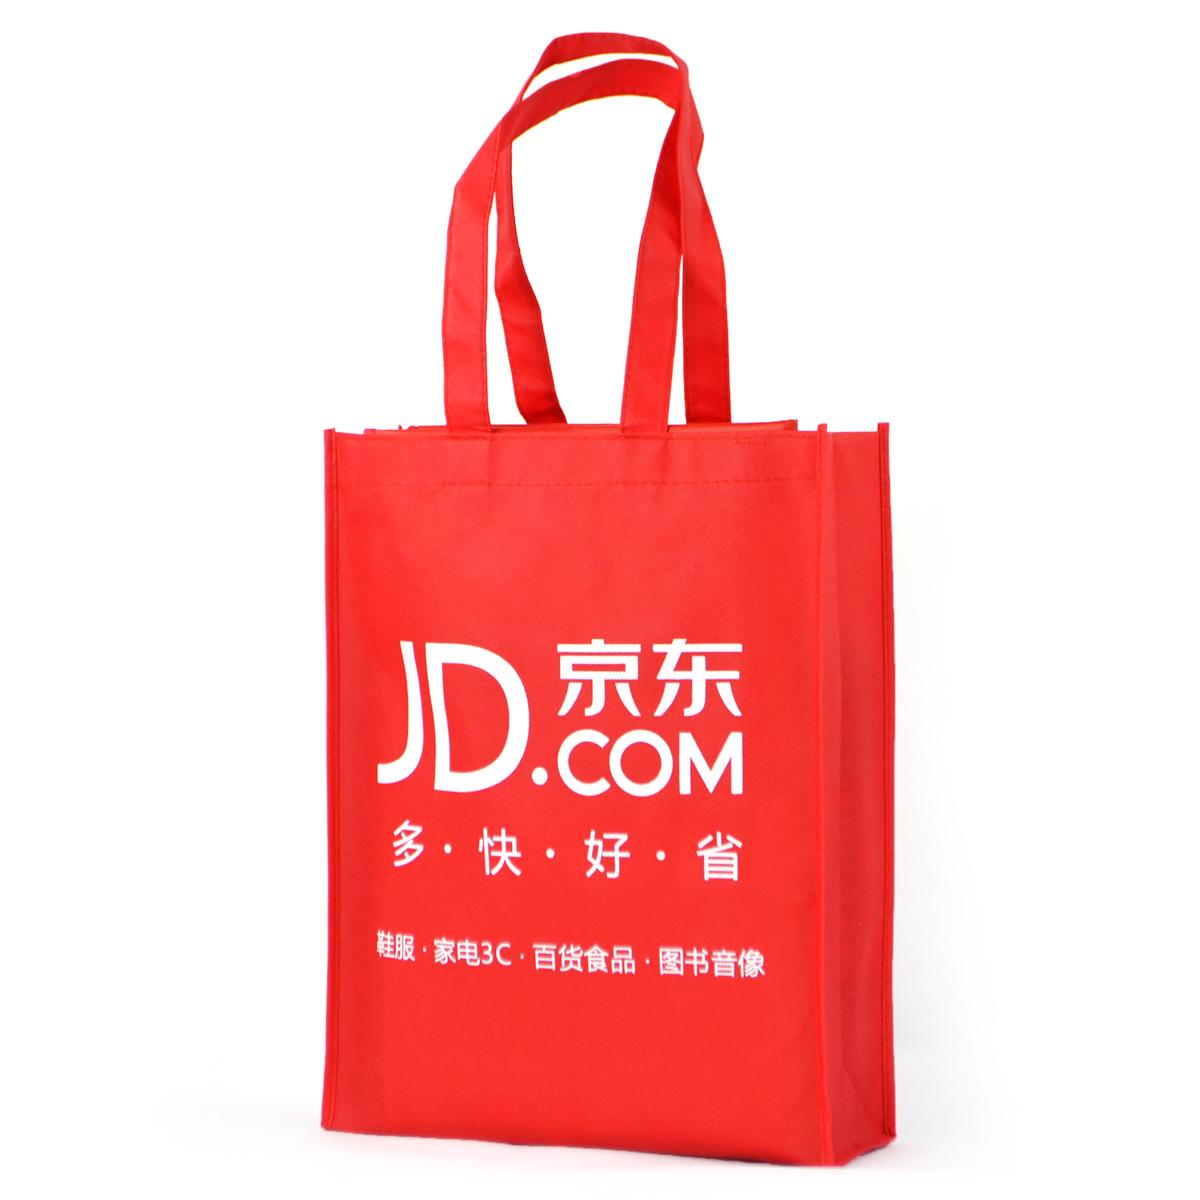 title='京东无纺布袋环保袋购物袋礼品袋'